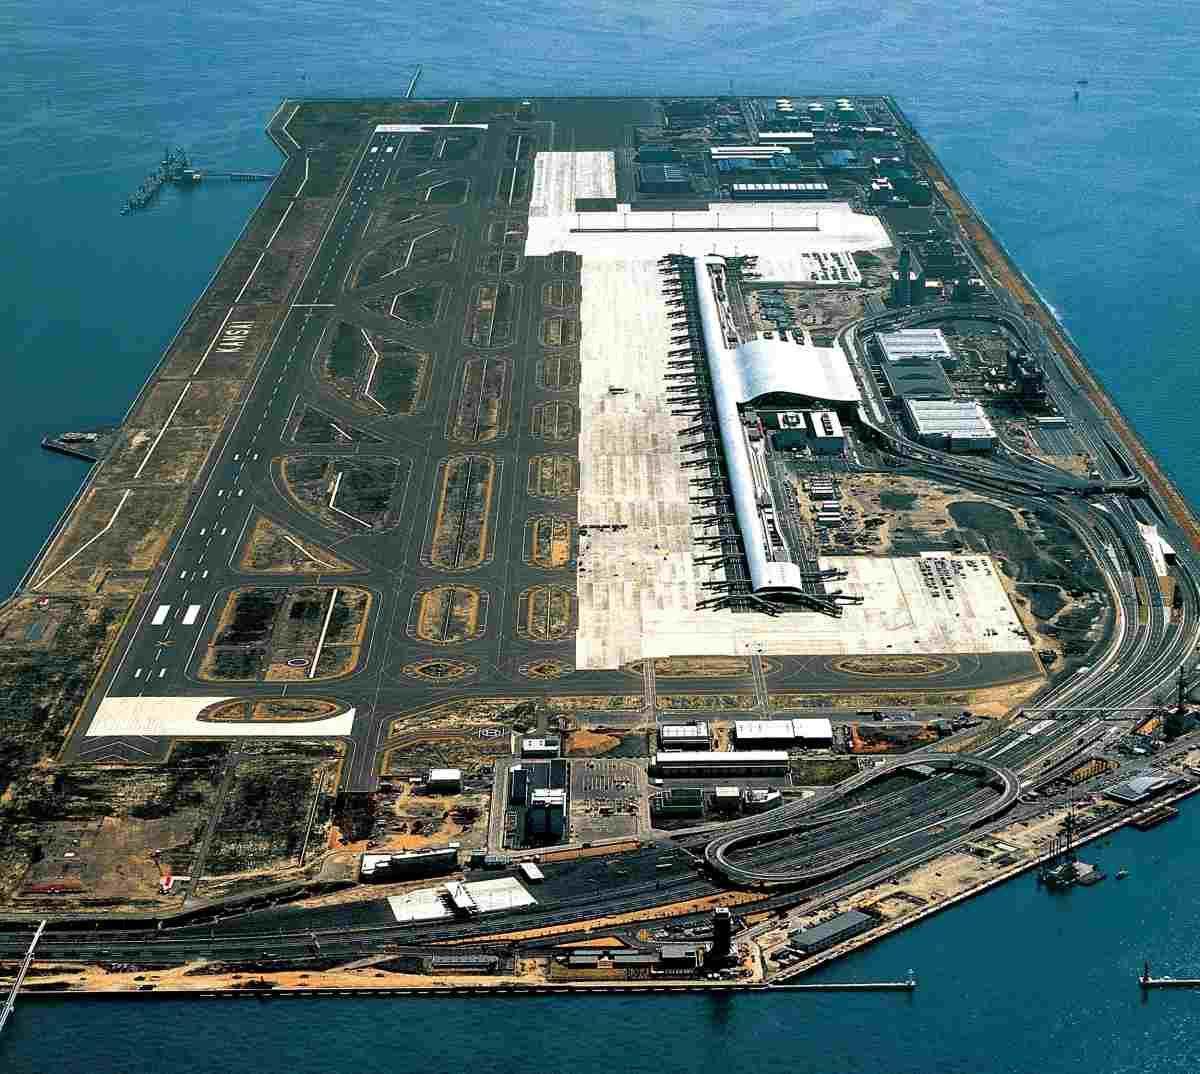 migliori-aeroporti-di-design-kansai-osaka-giappone